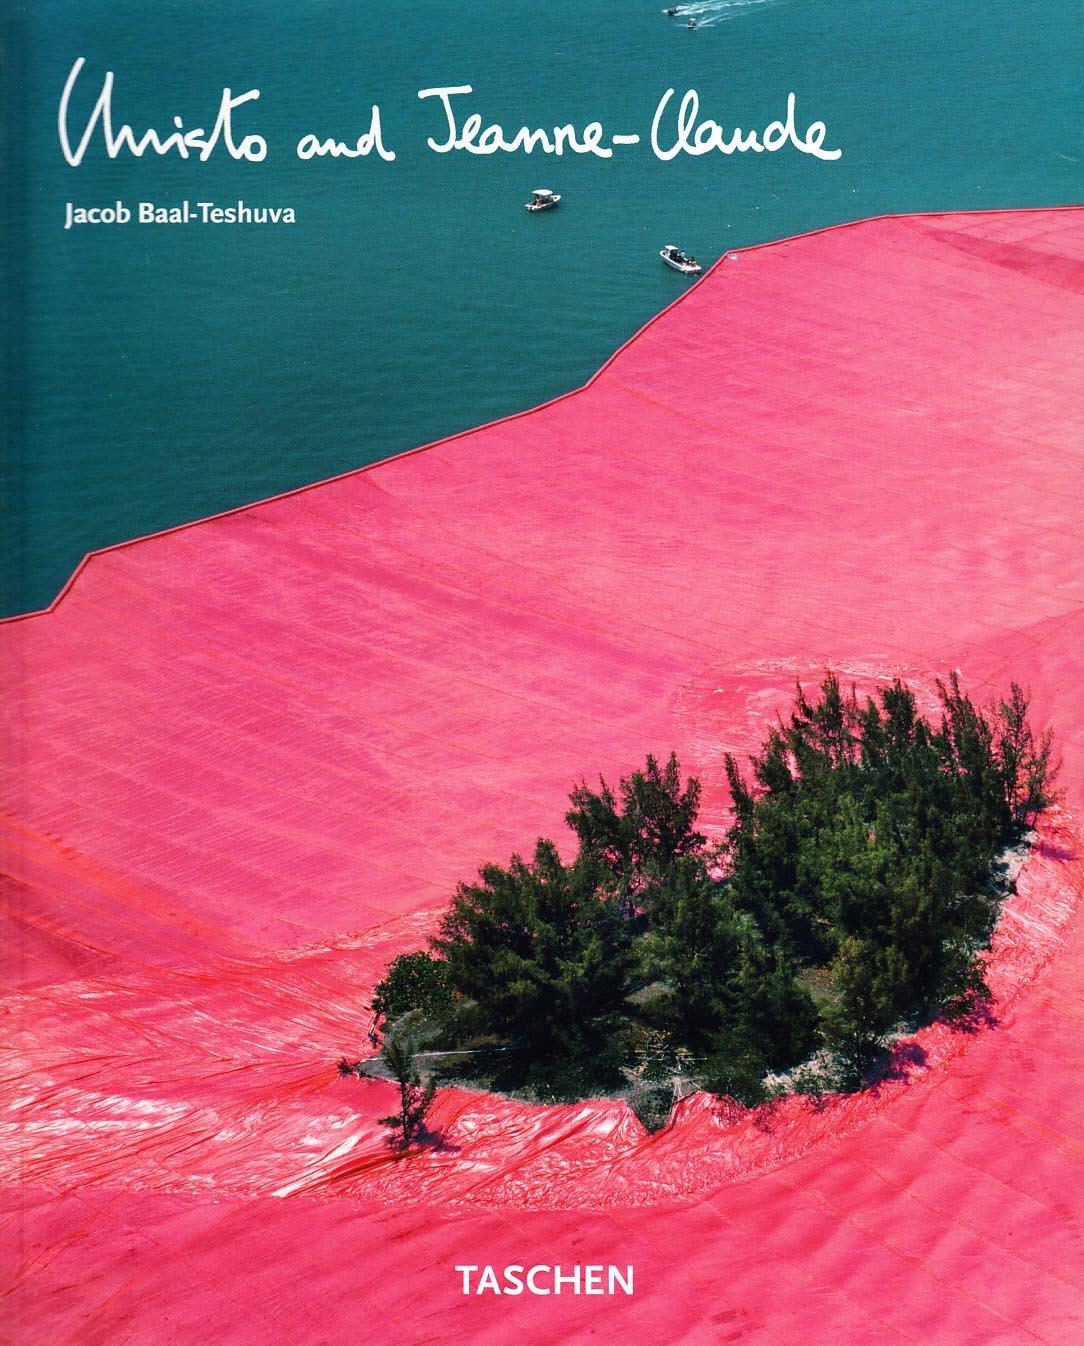 Christo and Jeanne-Claude. Ediz. illustrata (Inglese) Copertina flessibile – 26 ago 2003 Jacob Baal-Teshuva Taschen 3822825107 ART / Conceptual